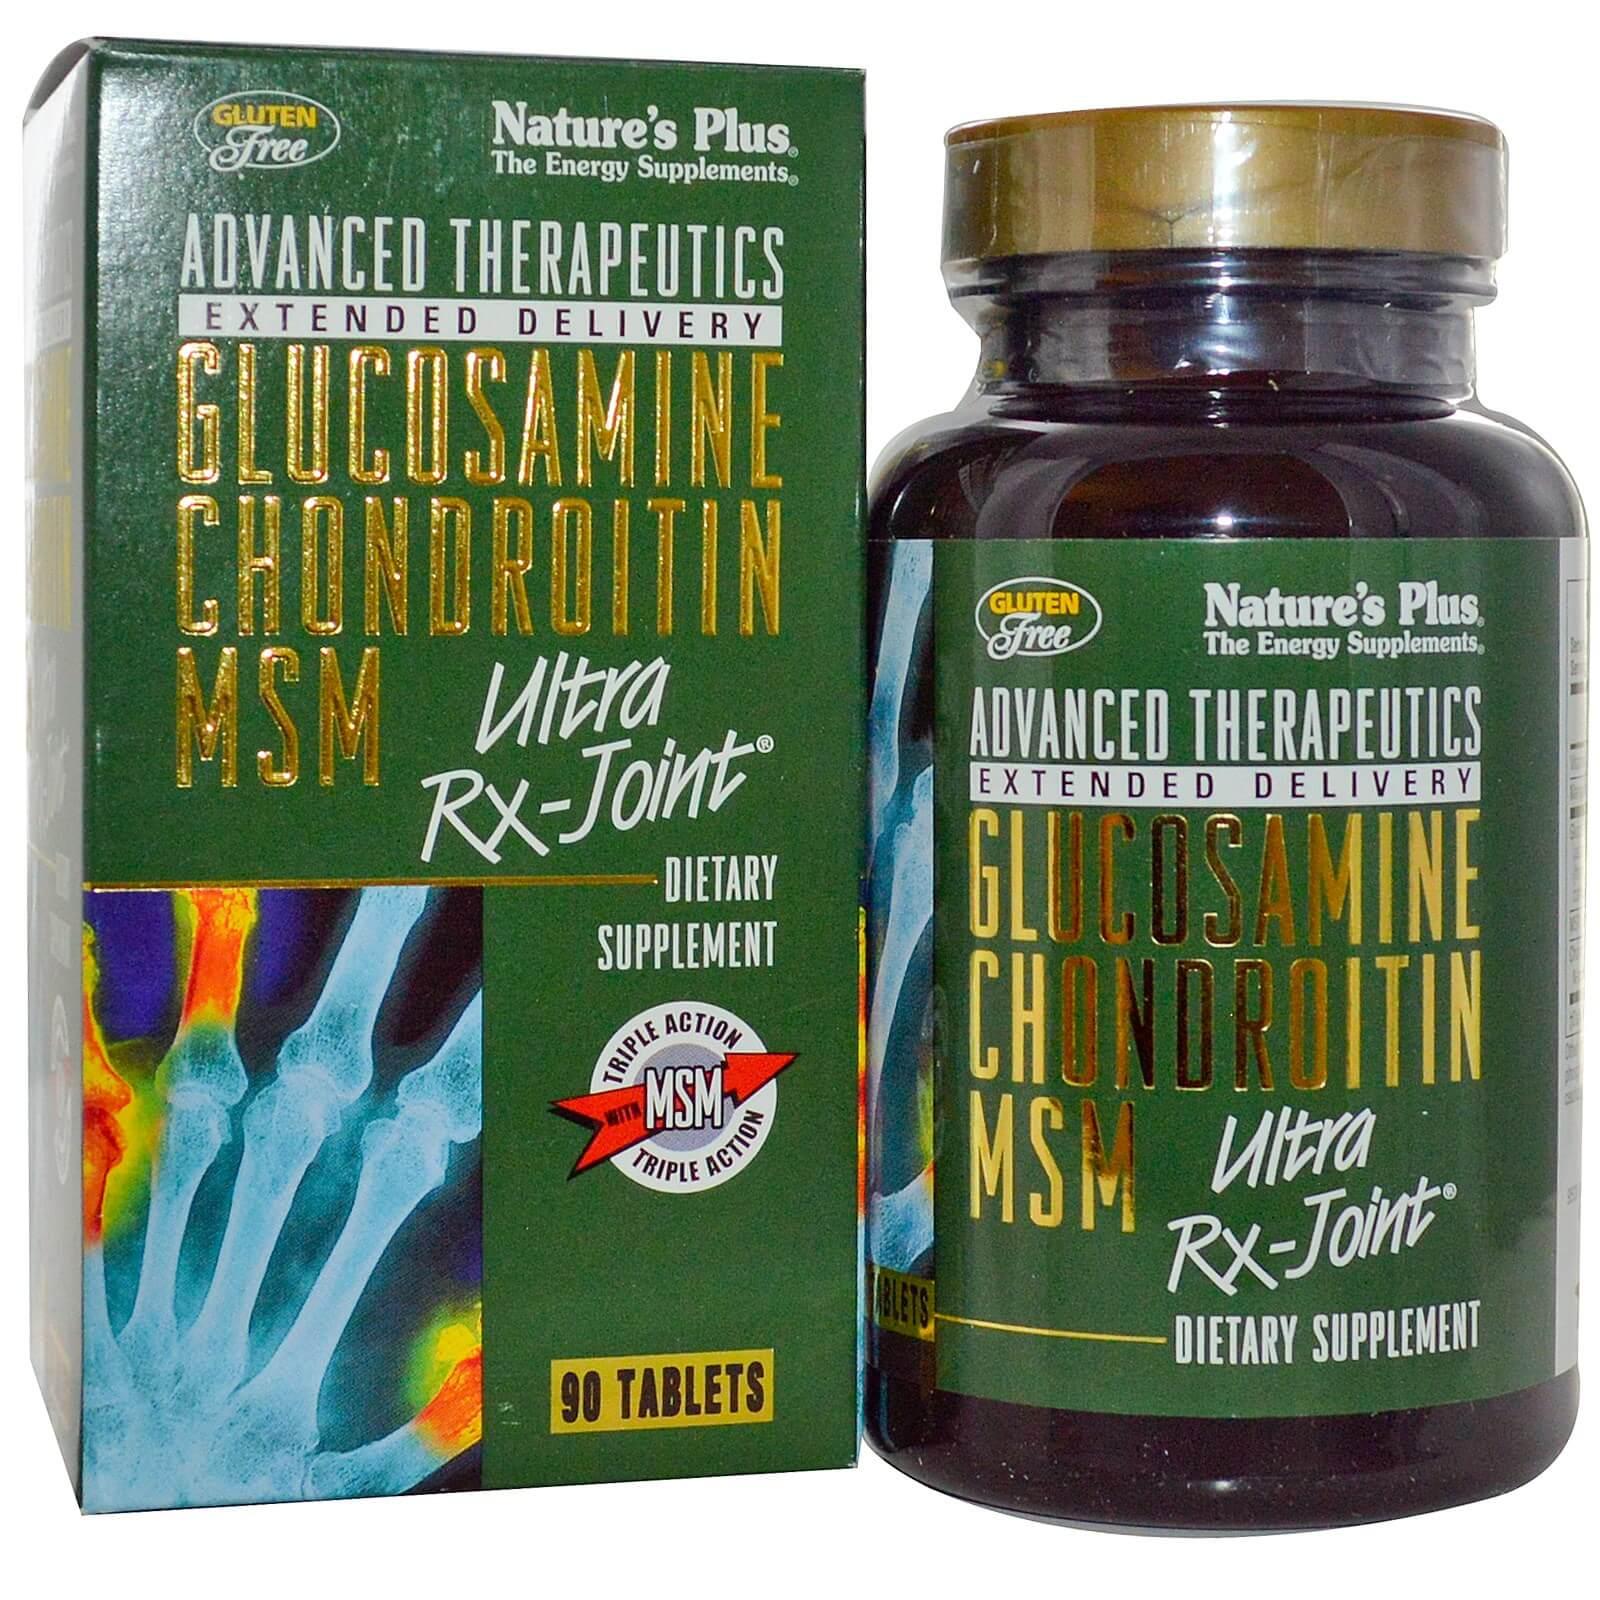 Natures Plus Glucosamine Chondroitin MSM Ultra Rx-JointΣυμπλήρωμα Διατροφής για την Υγεία των Αρθρώσεων 90 Tabs